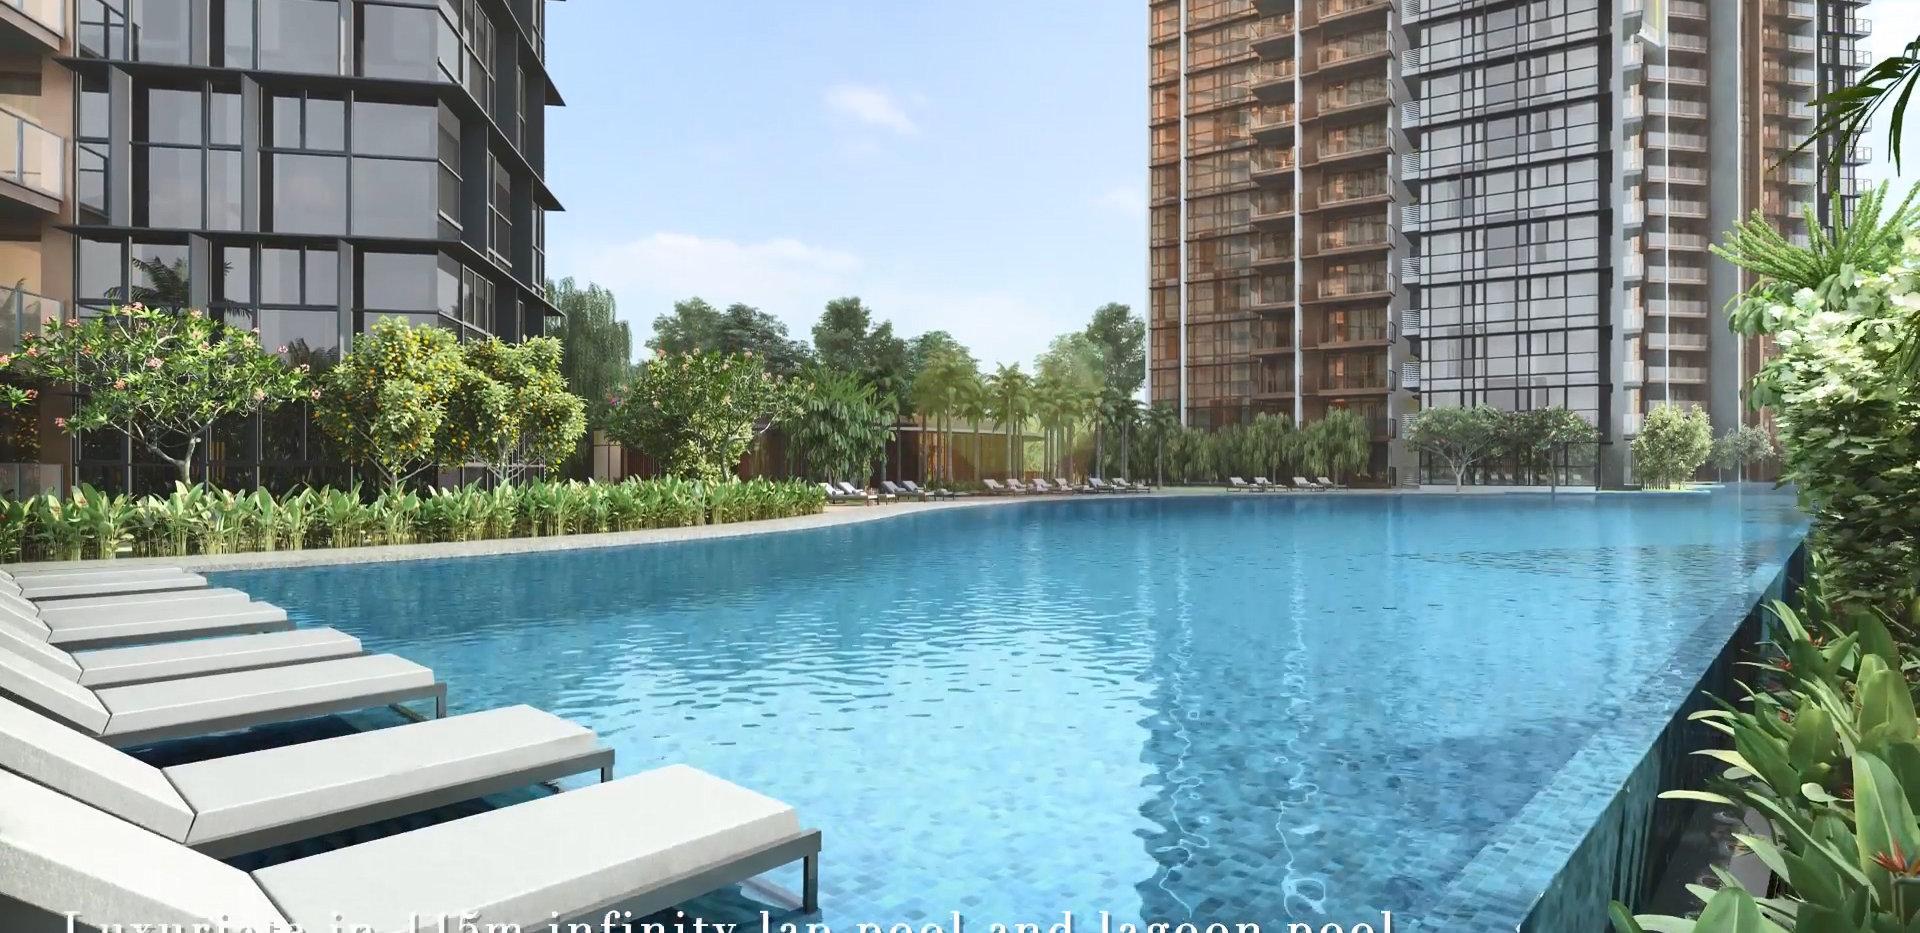 seaside-residences-lap-pool-lagoon-pool.